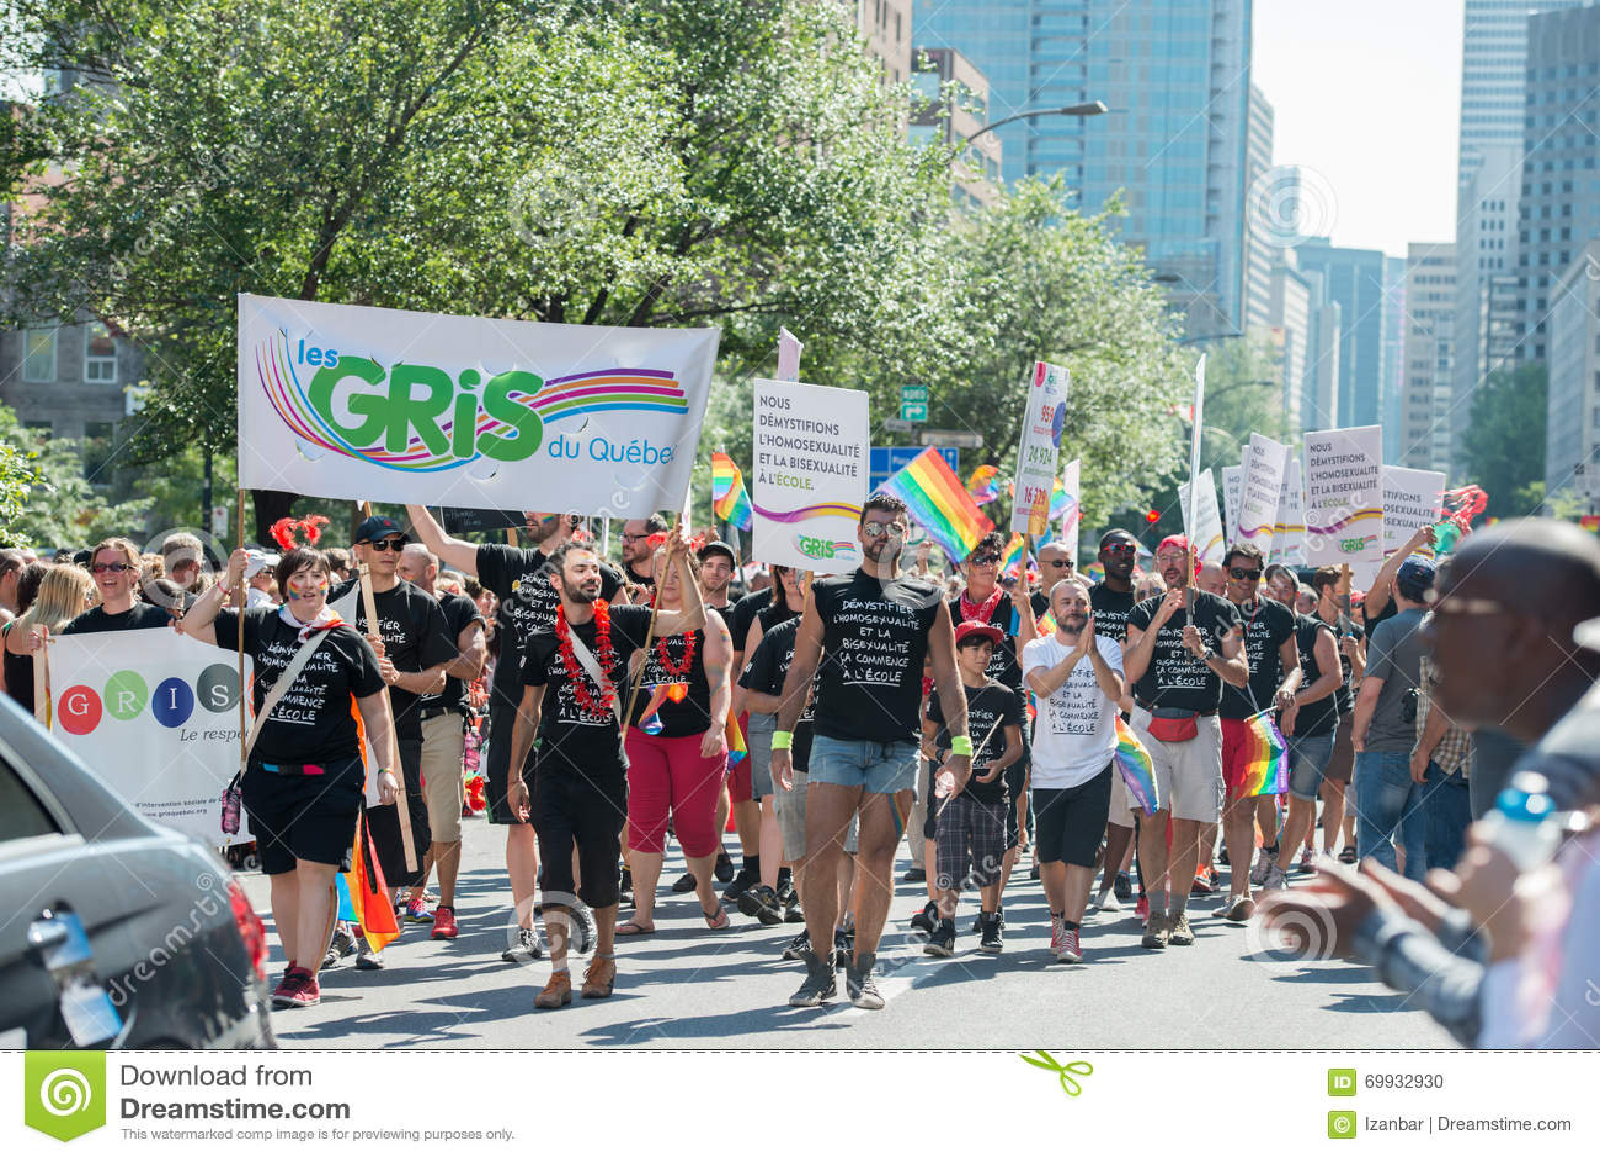 Montreal Pride shows its true colours | Montreal Gazette